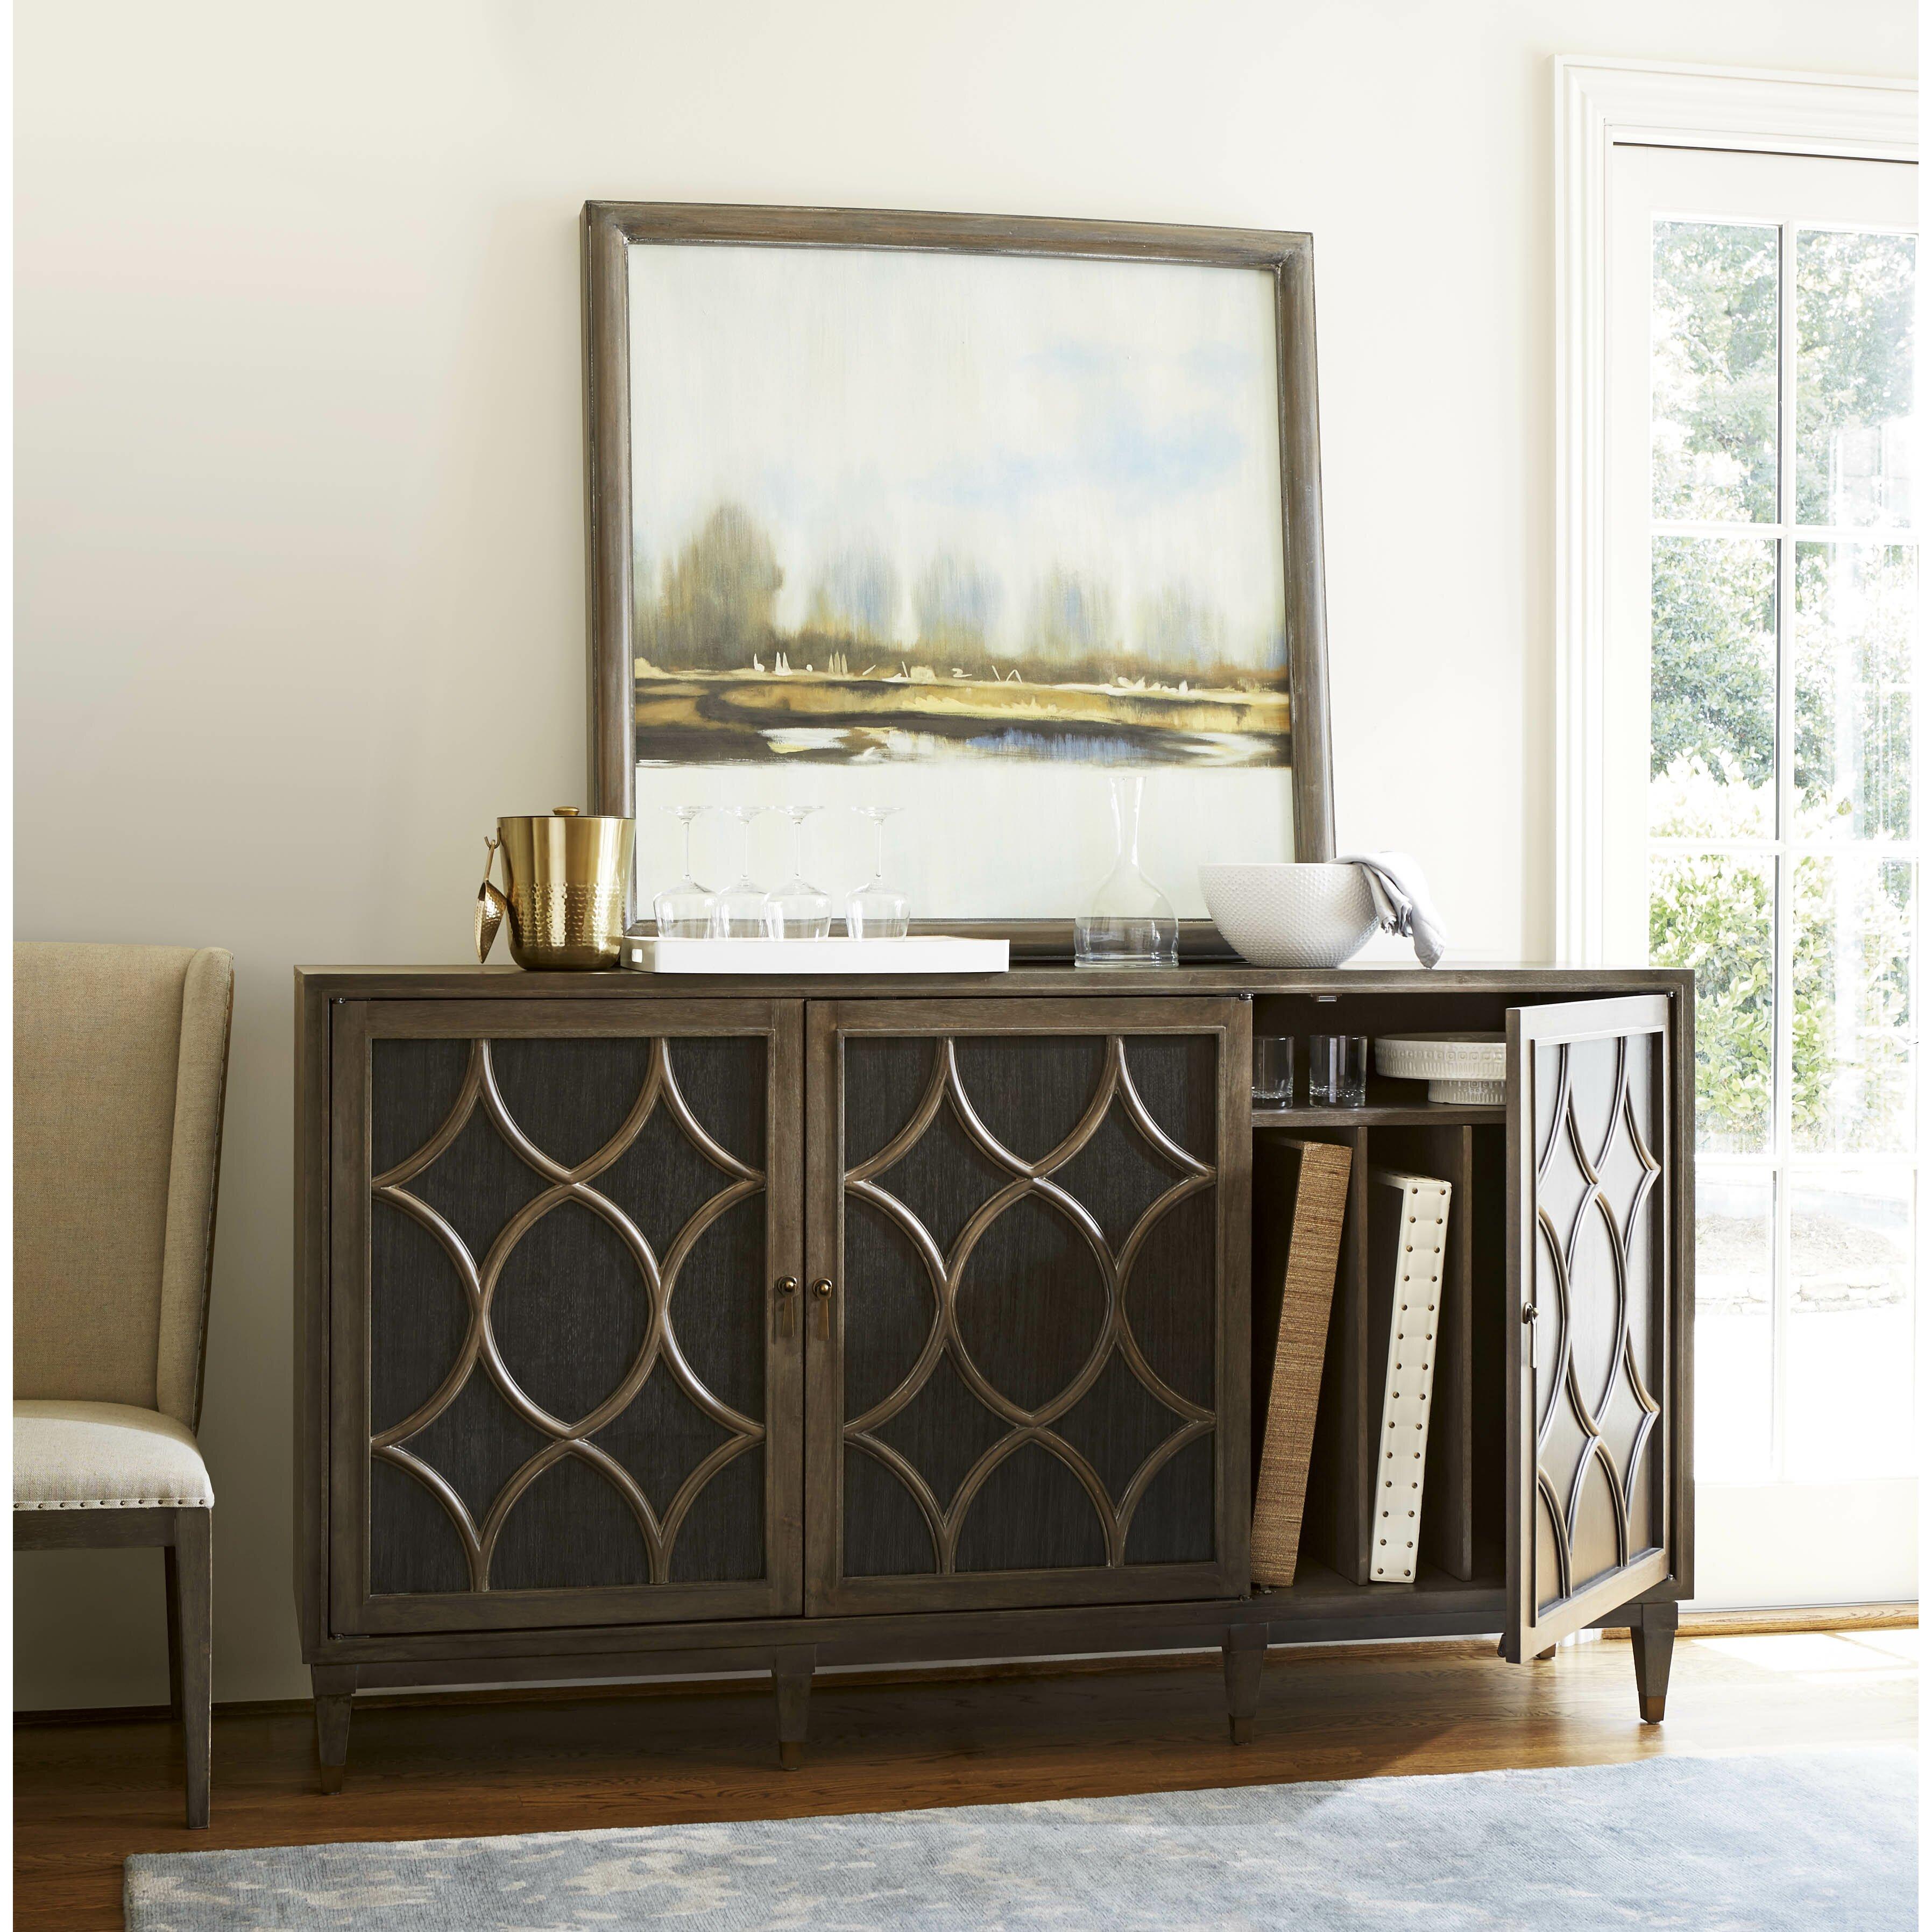 Universal Furniture Playlist Sideboard